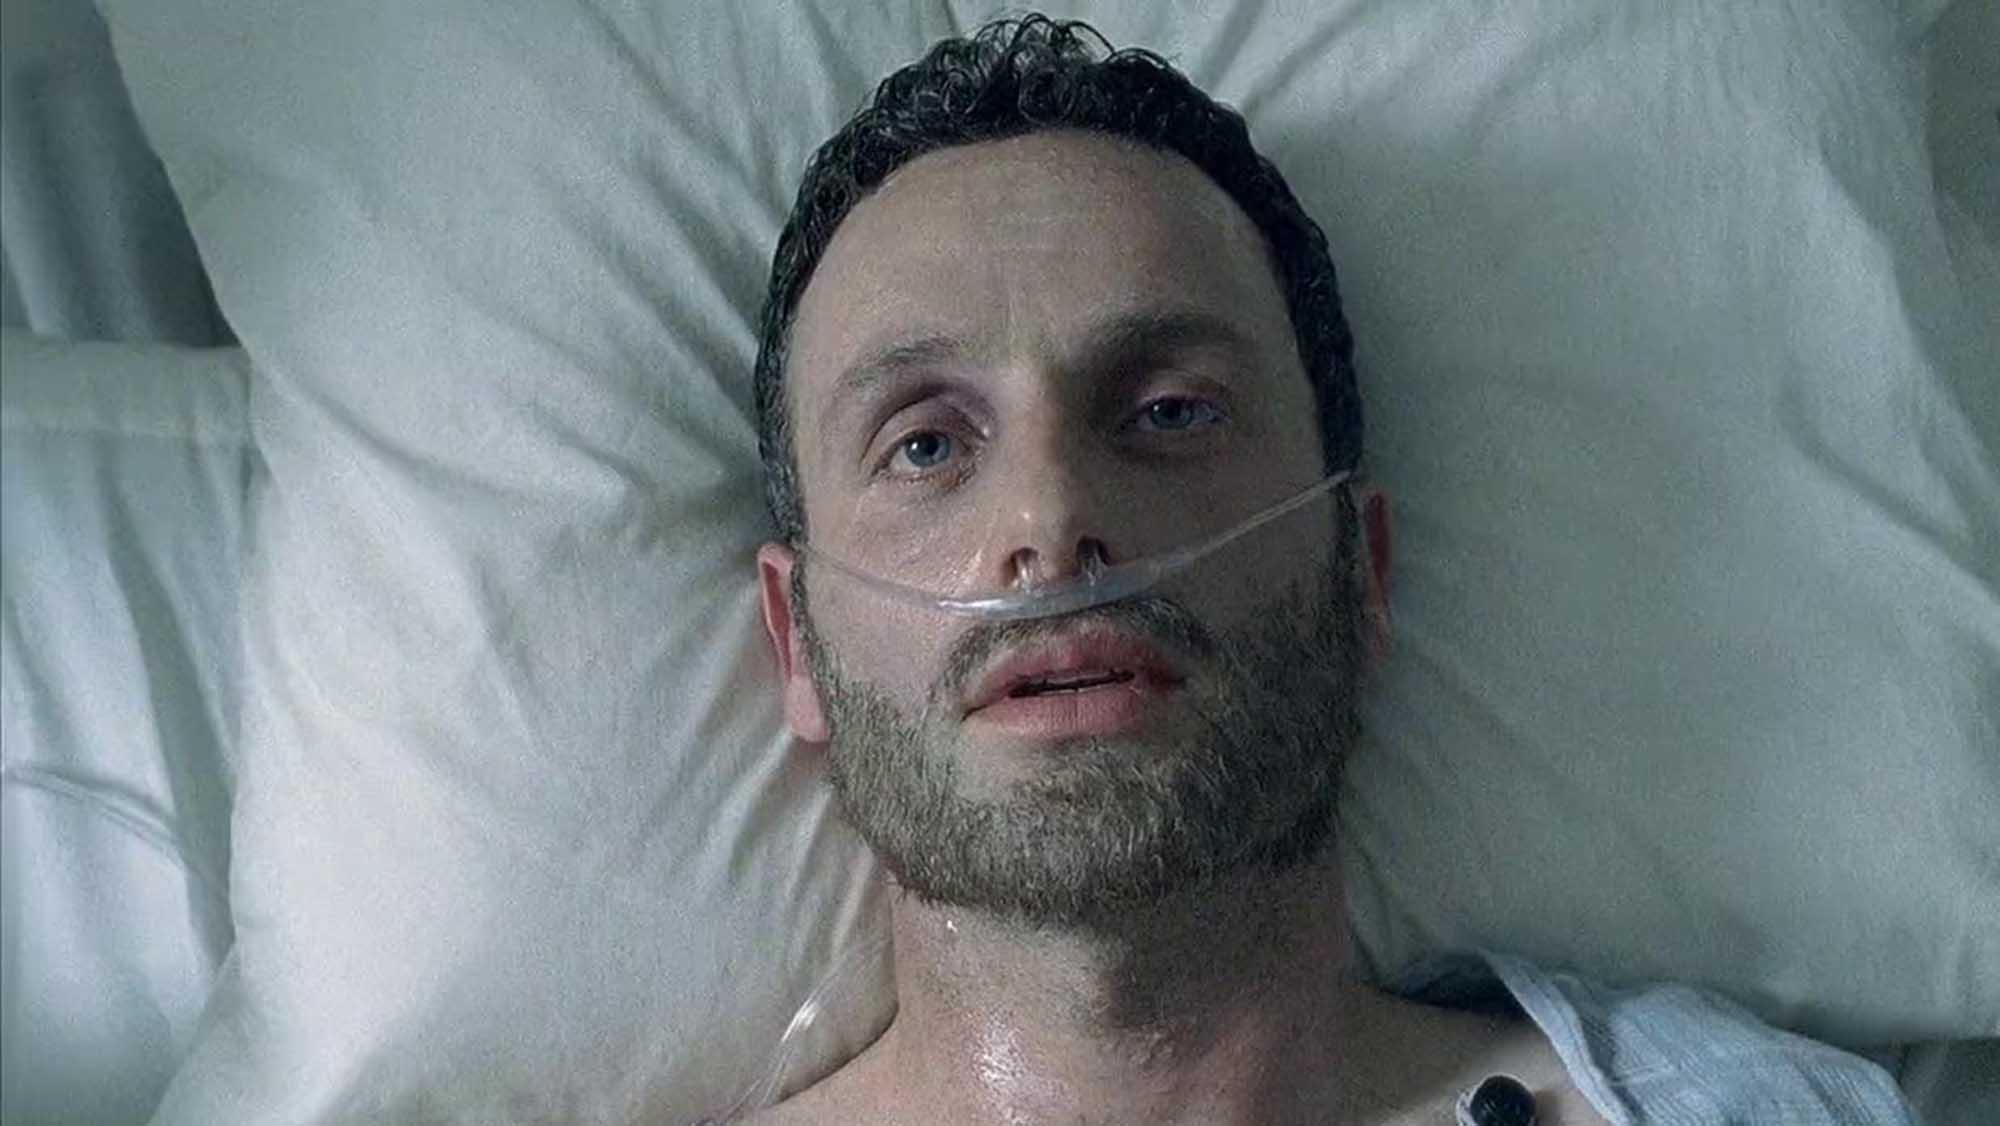 twds01e01d Review: The Walking Dead S01E01 - Days gone bye